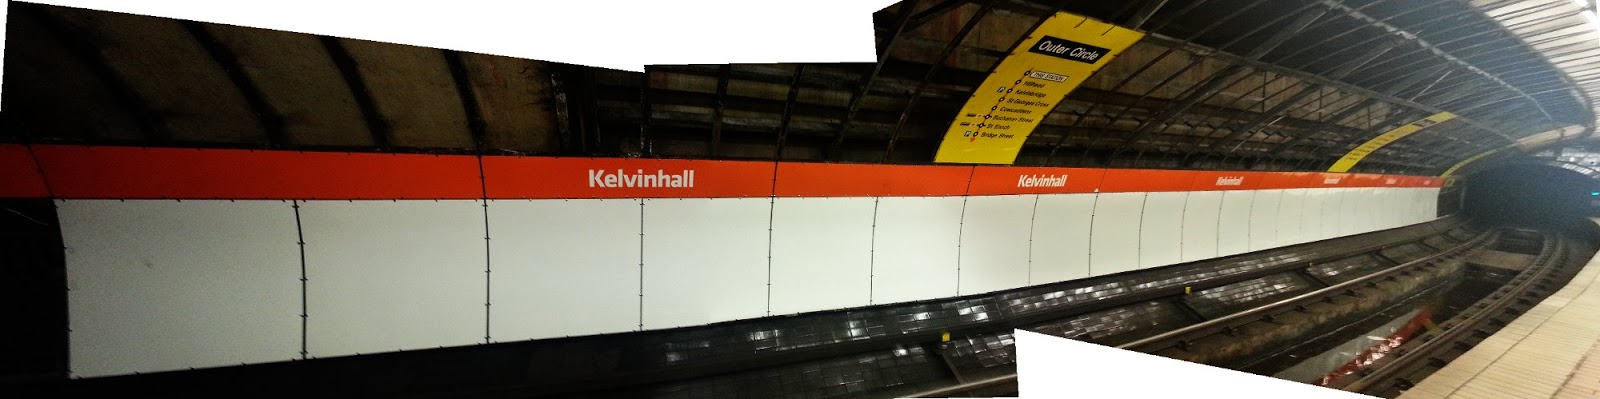 Kelvinhall Underground Station, Glasgow